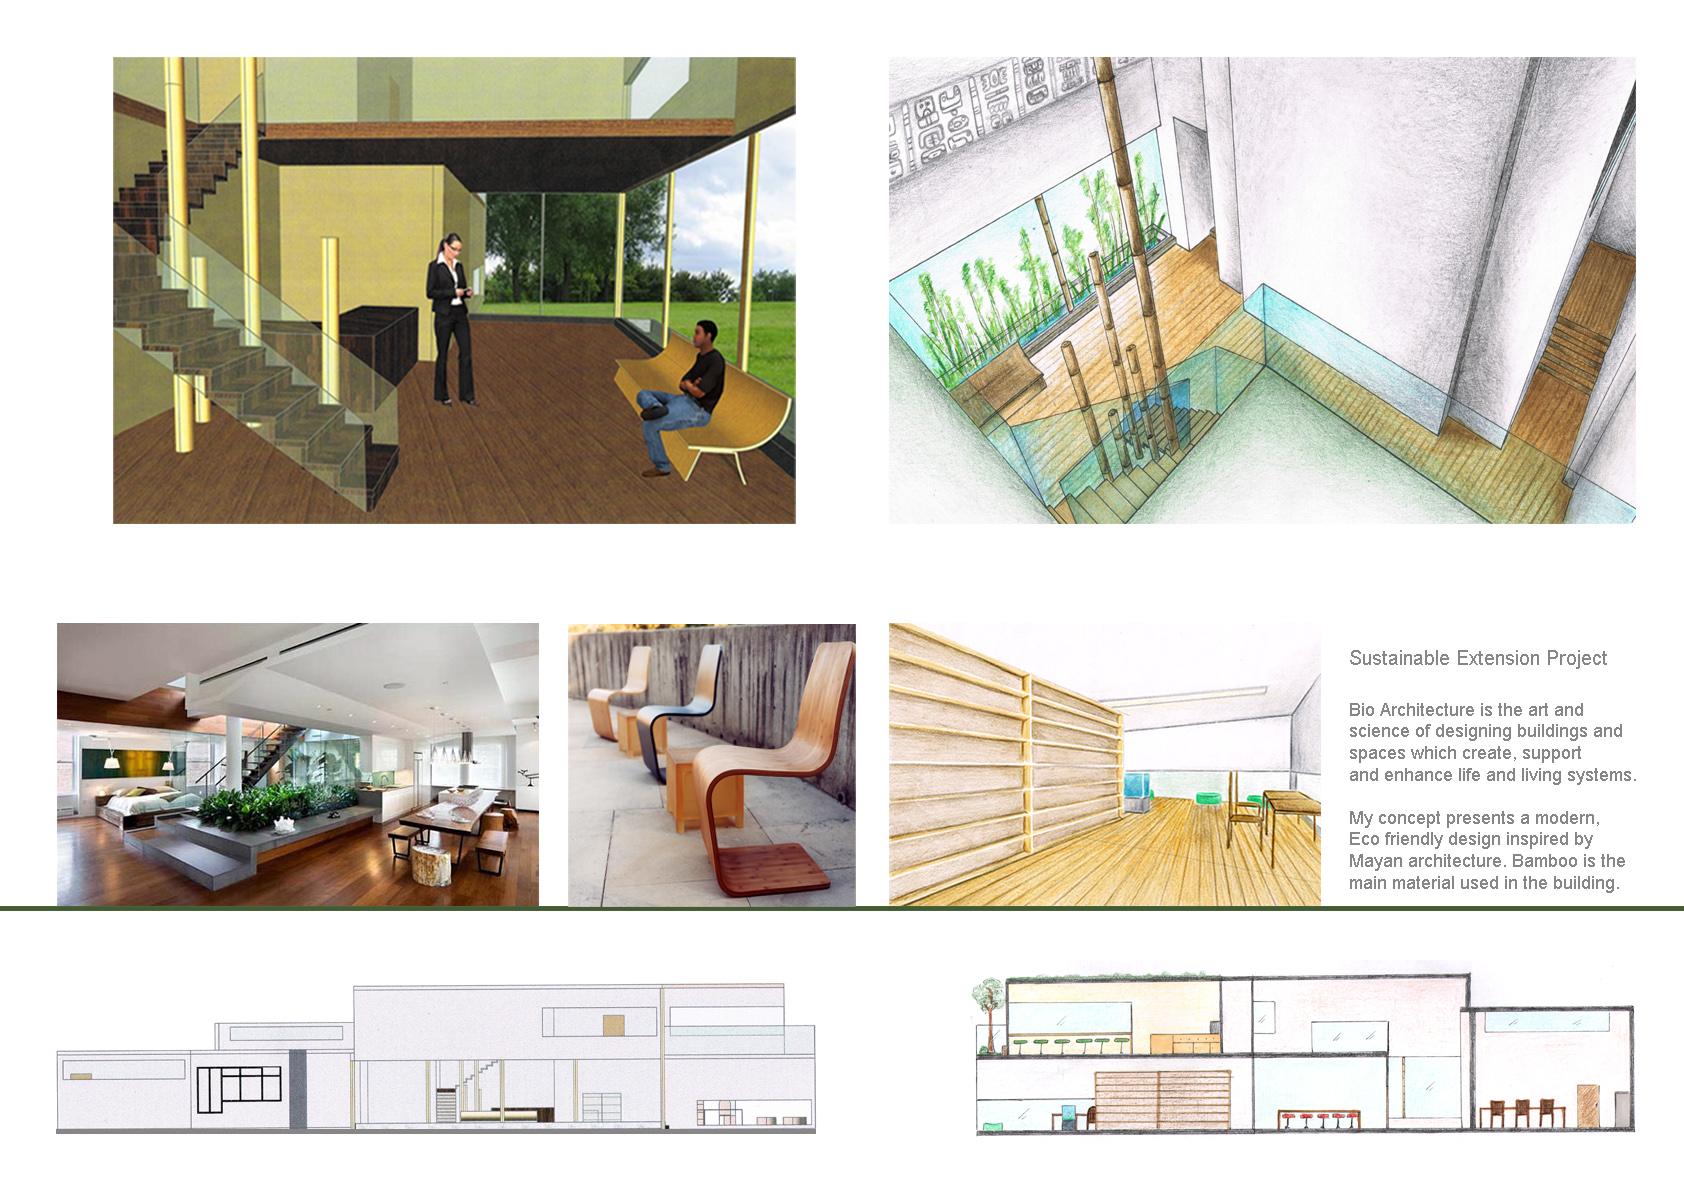 Eco Project Interior Design At Coláiste Dhúlaigh